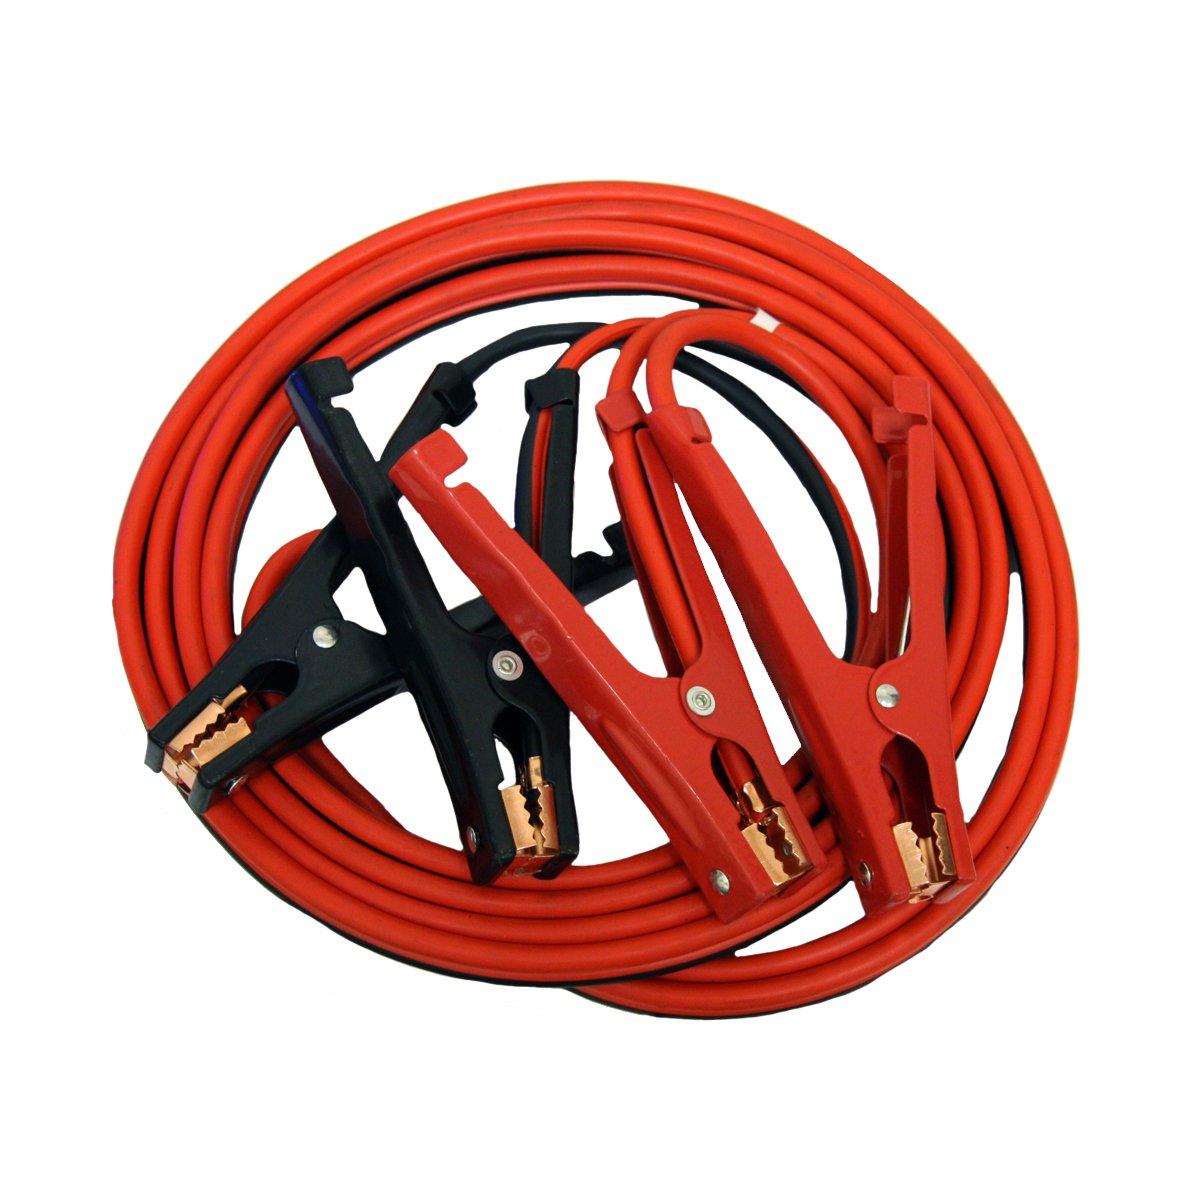 GRIP (GRAND RAPIDS INDUSTRIAL) 38058 16 ft 8 Gauge Jumper Cables by GRIP (GRAND RAPIDS INDUSTRIAL)